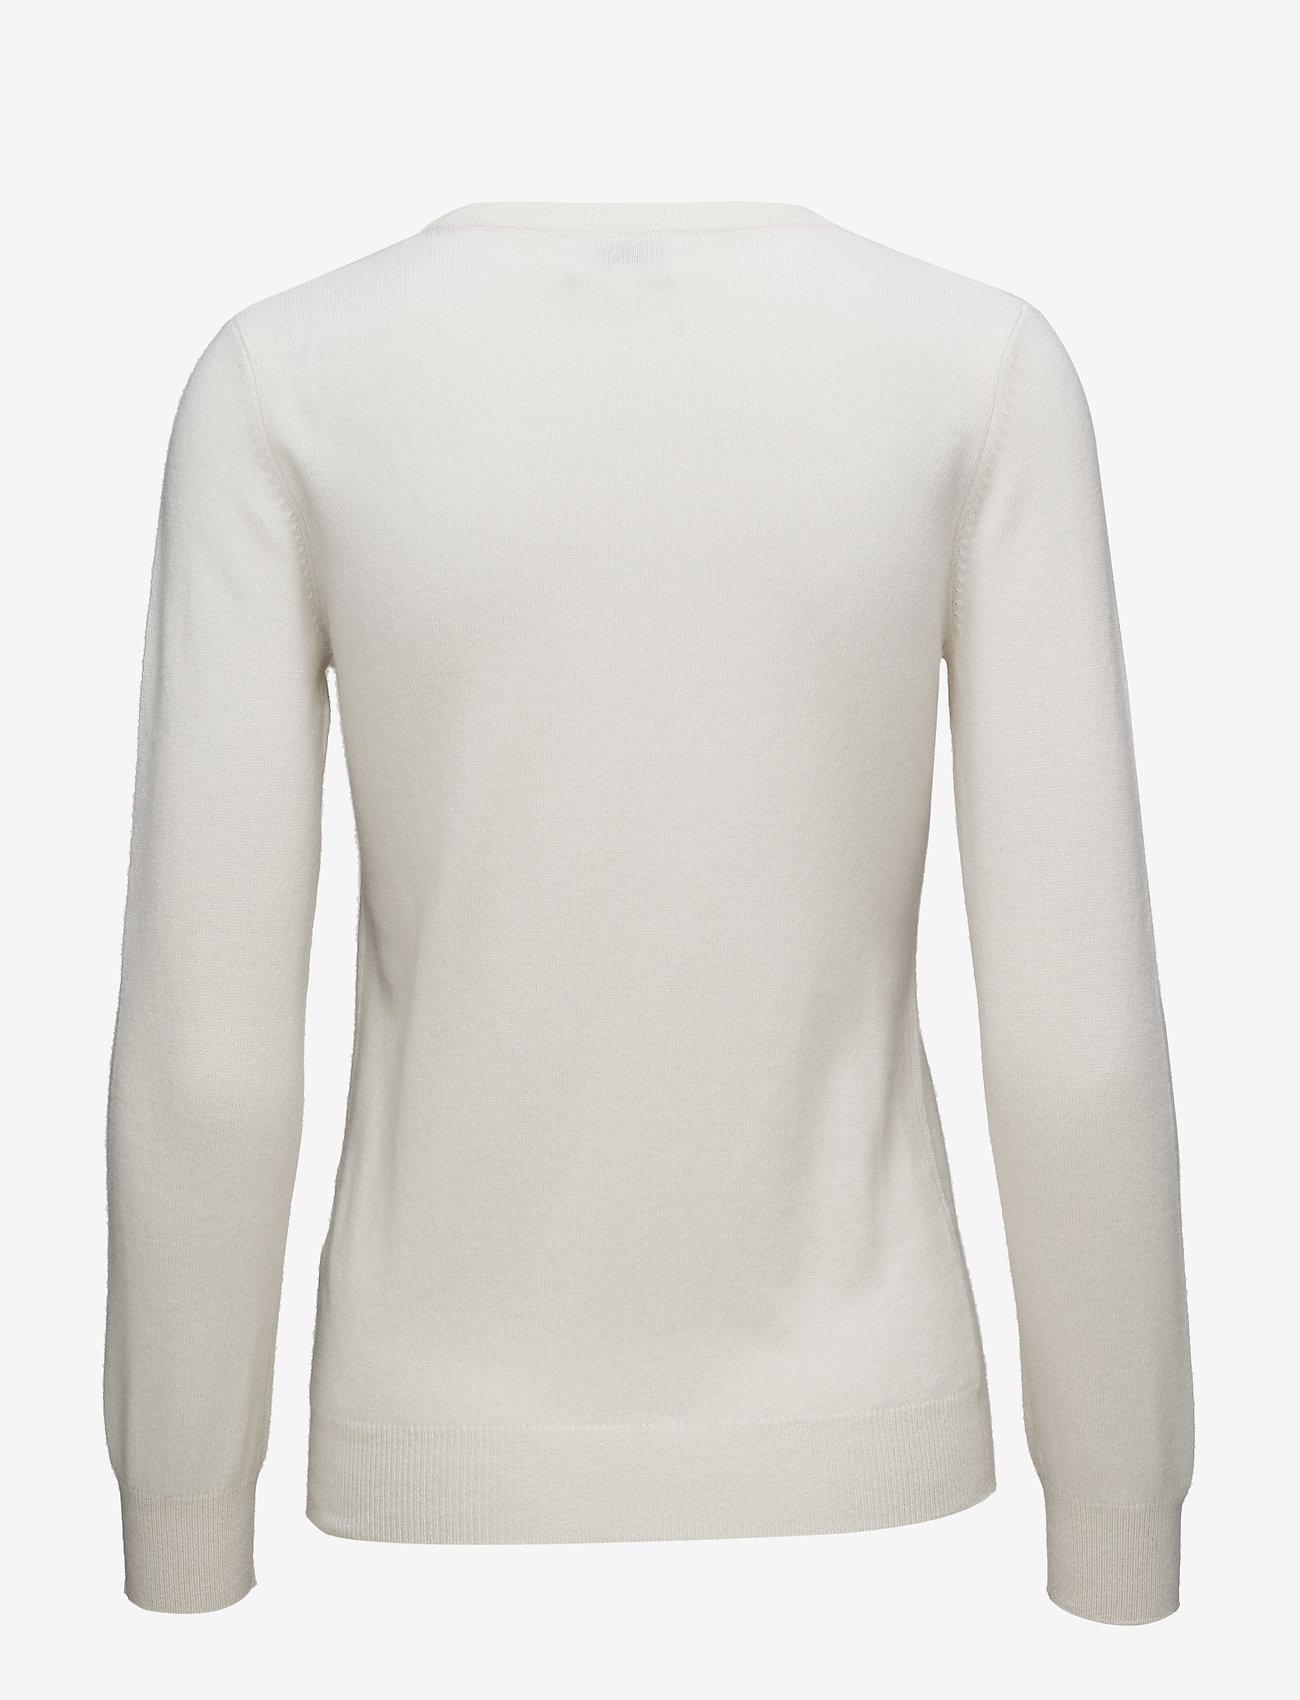 Davida Cashmere - Basic sweater - sweaters - white - 1